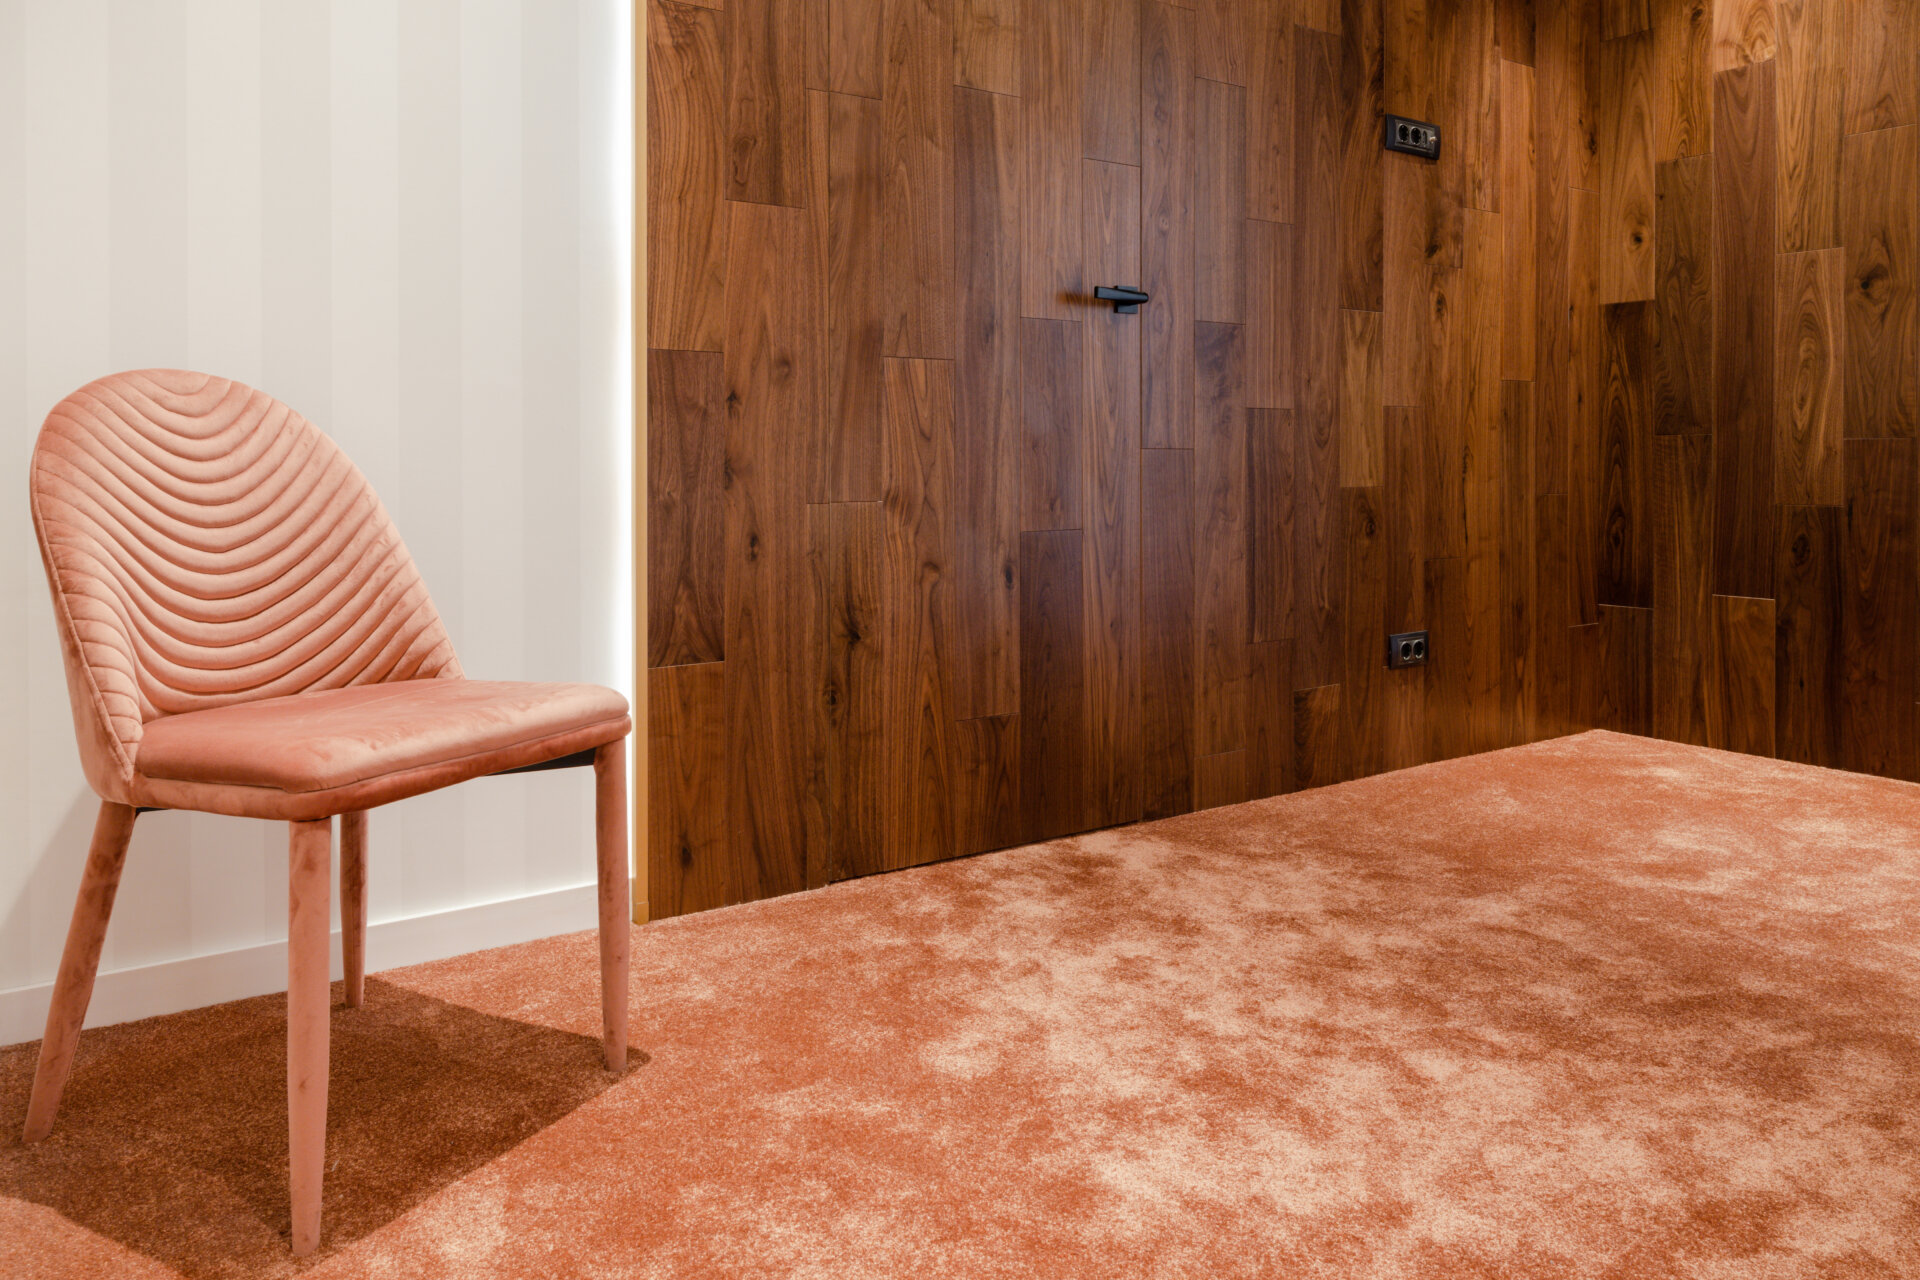 20210303-carpet&more-ap-cristi-craiova-by-hugmedia-05